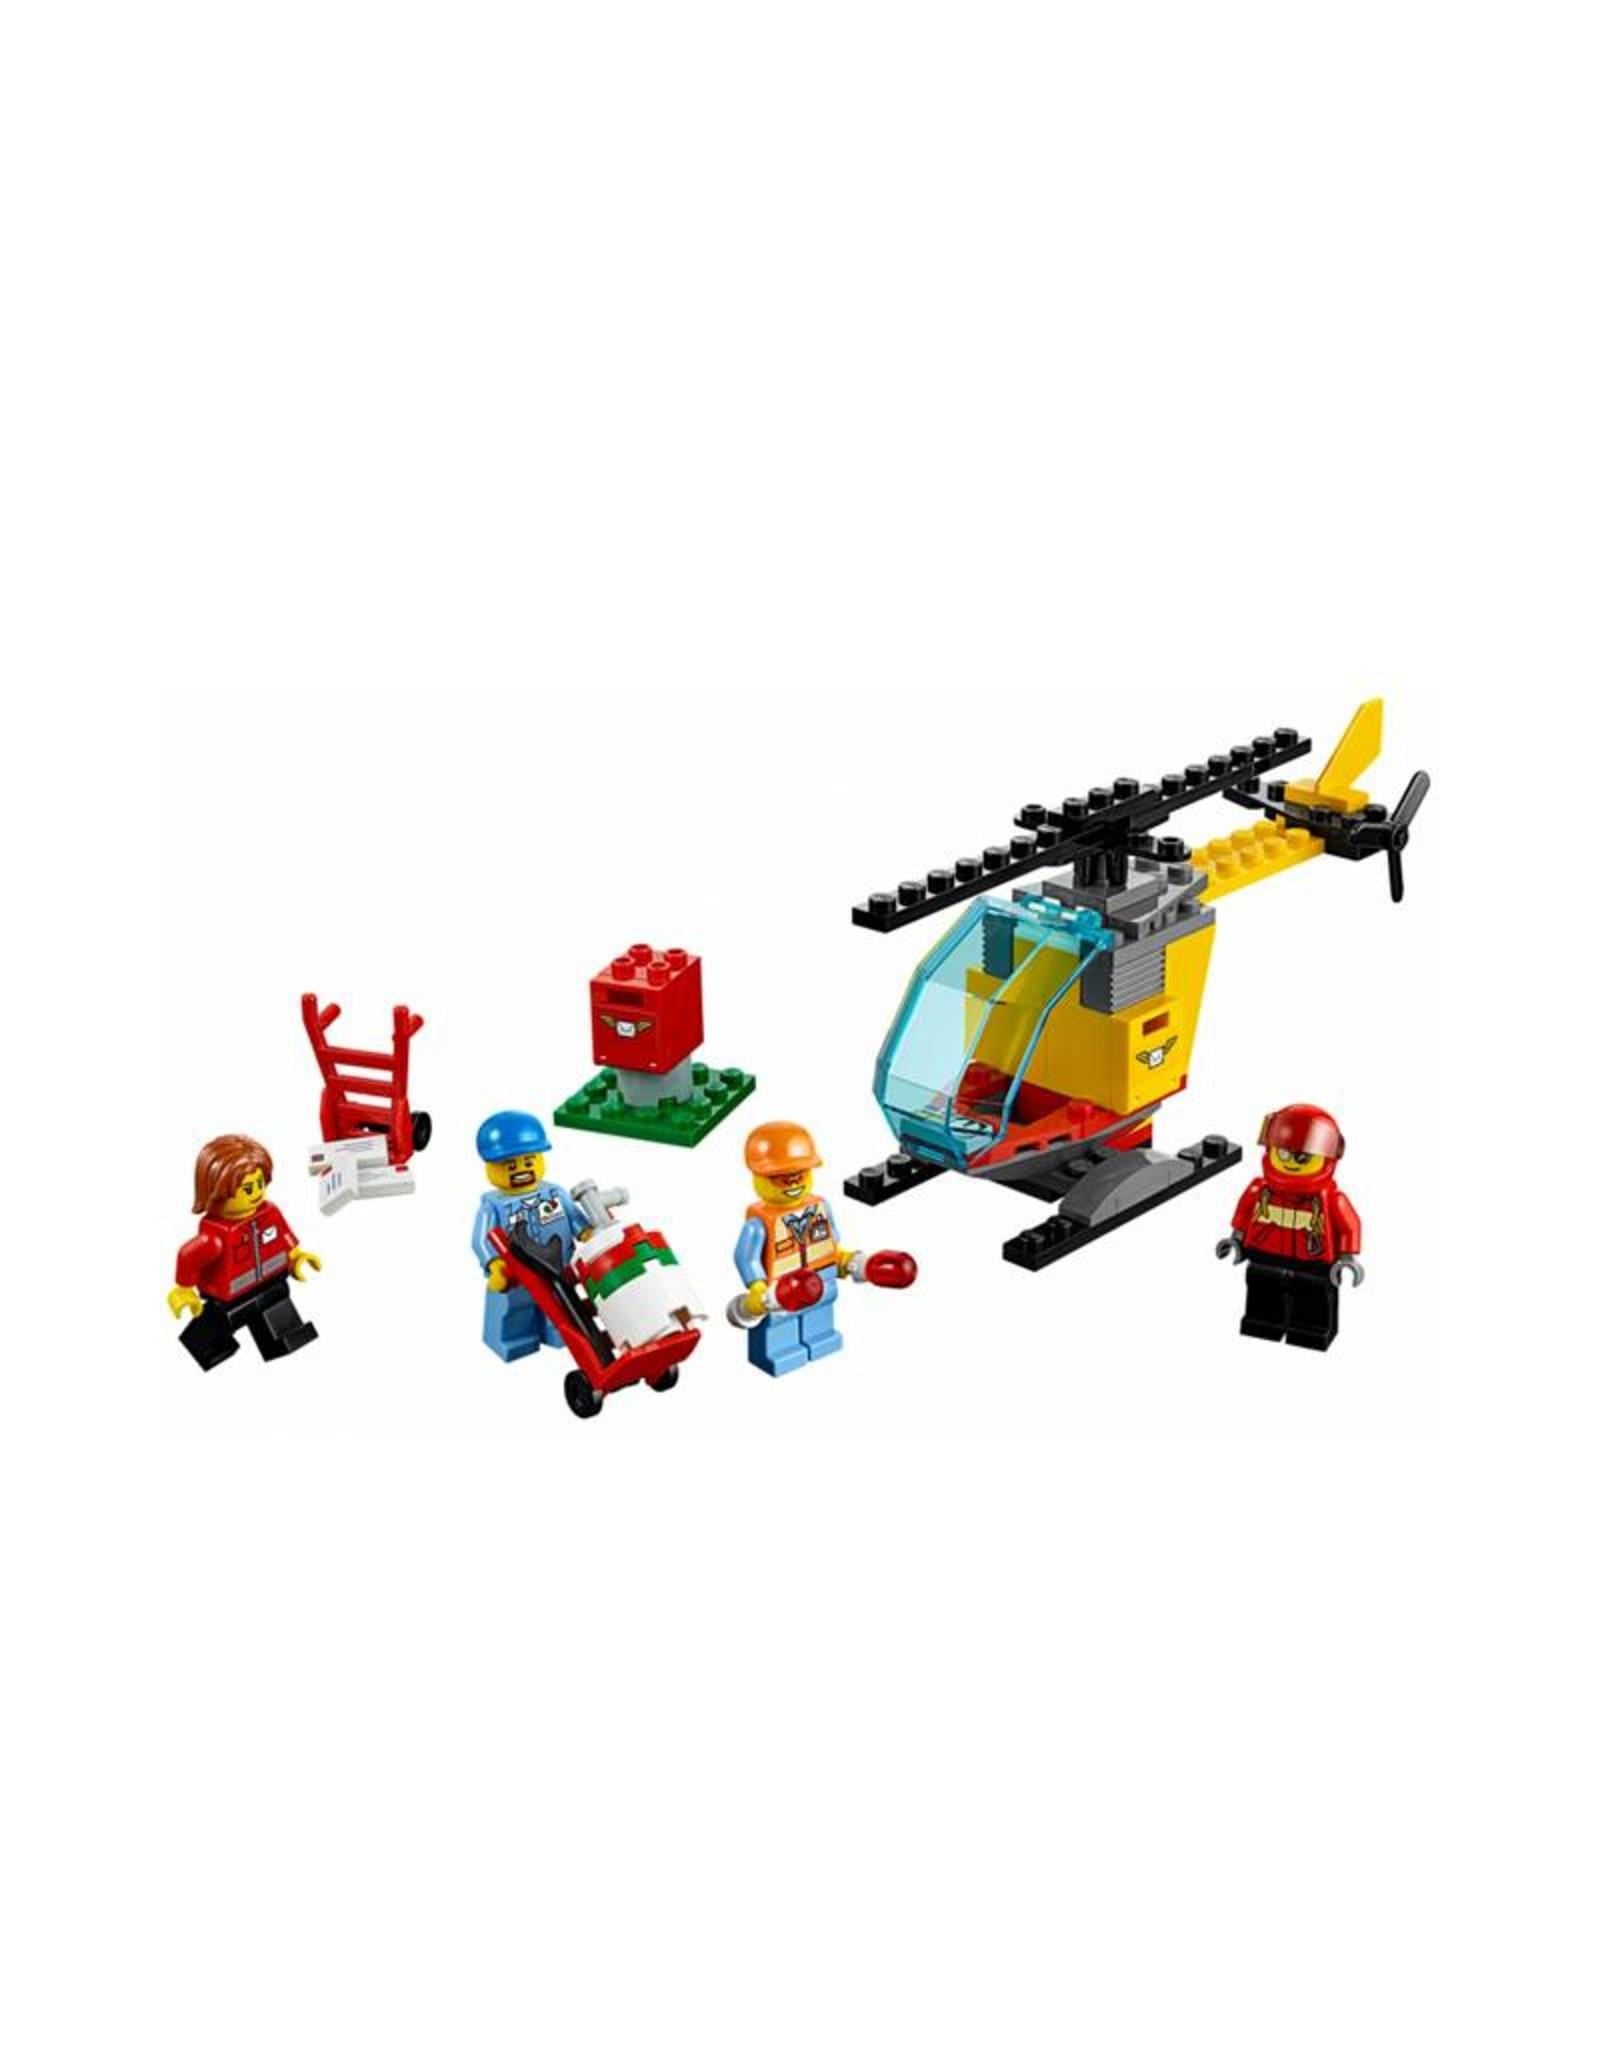 LEGO LEGO 60100 Airport Starterset CITY